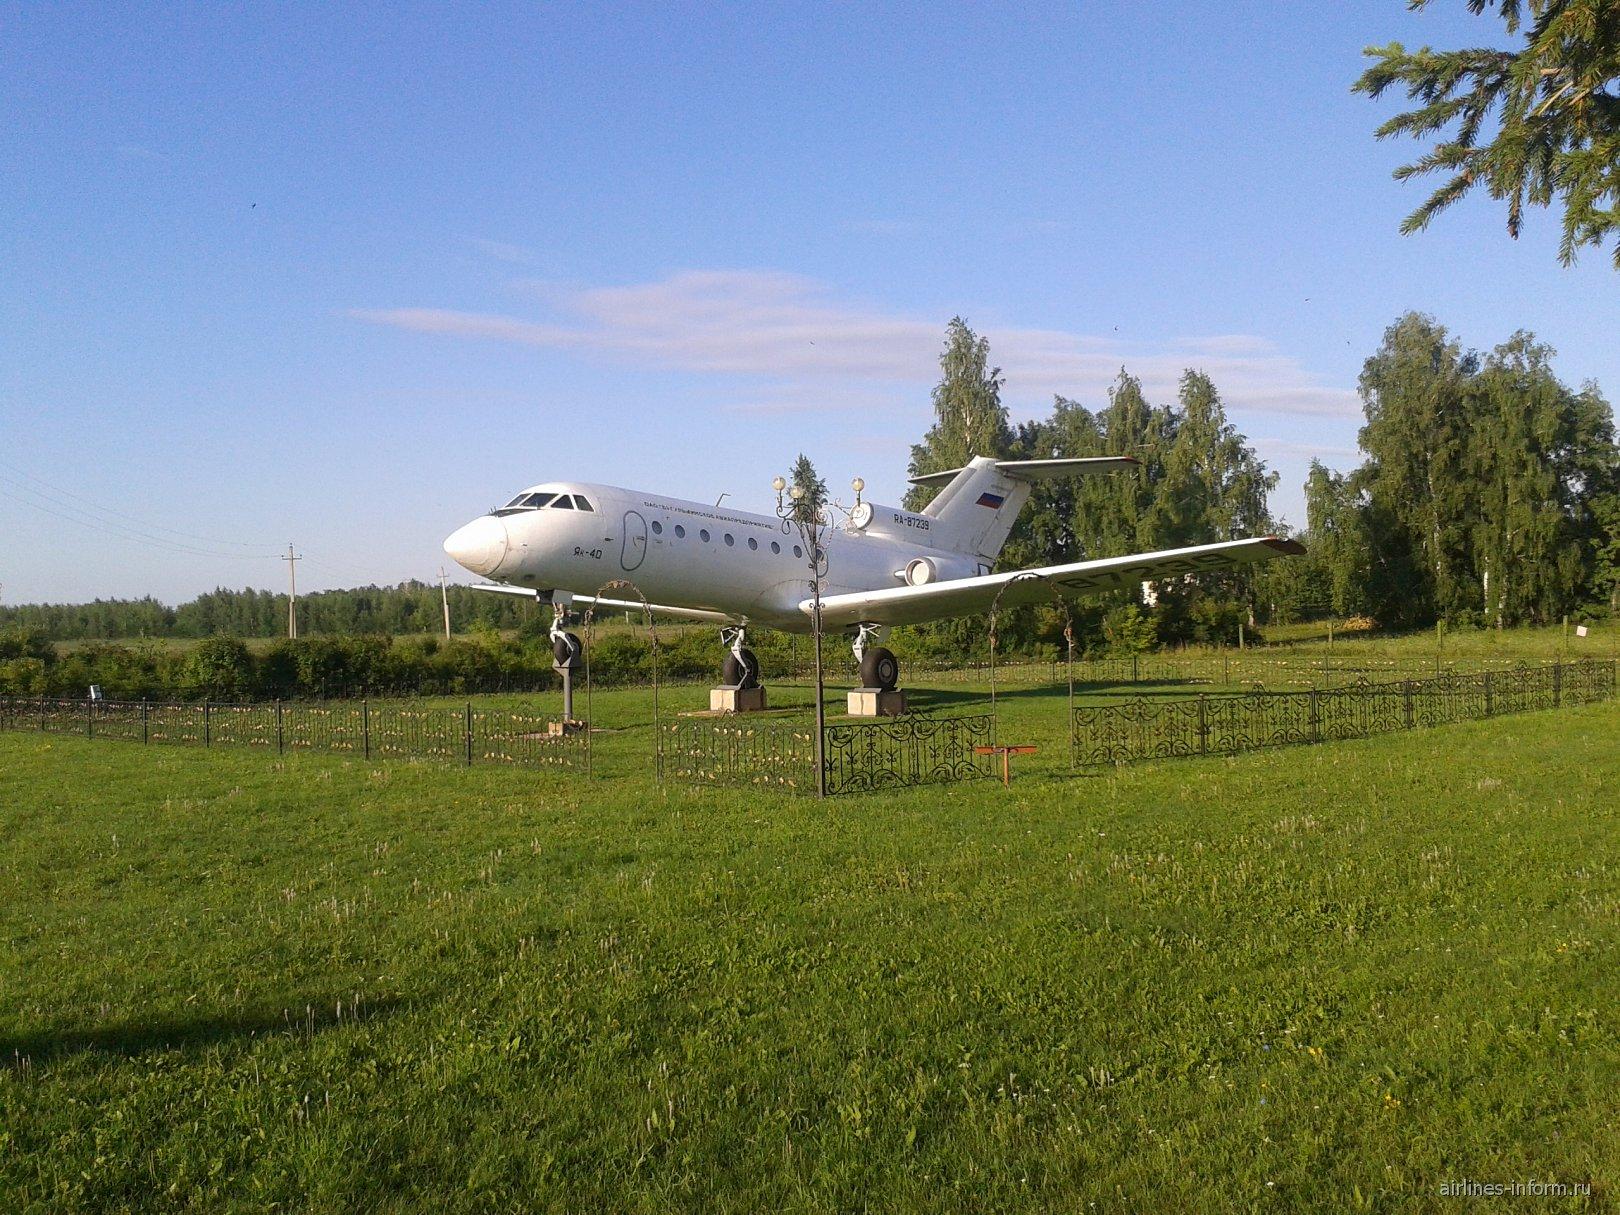 Памятник Як-40 в аэропорту Бугульма